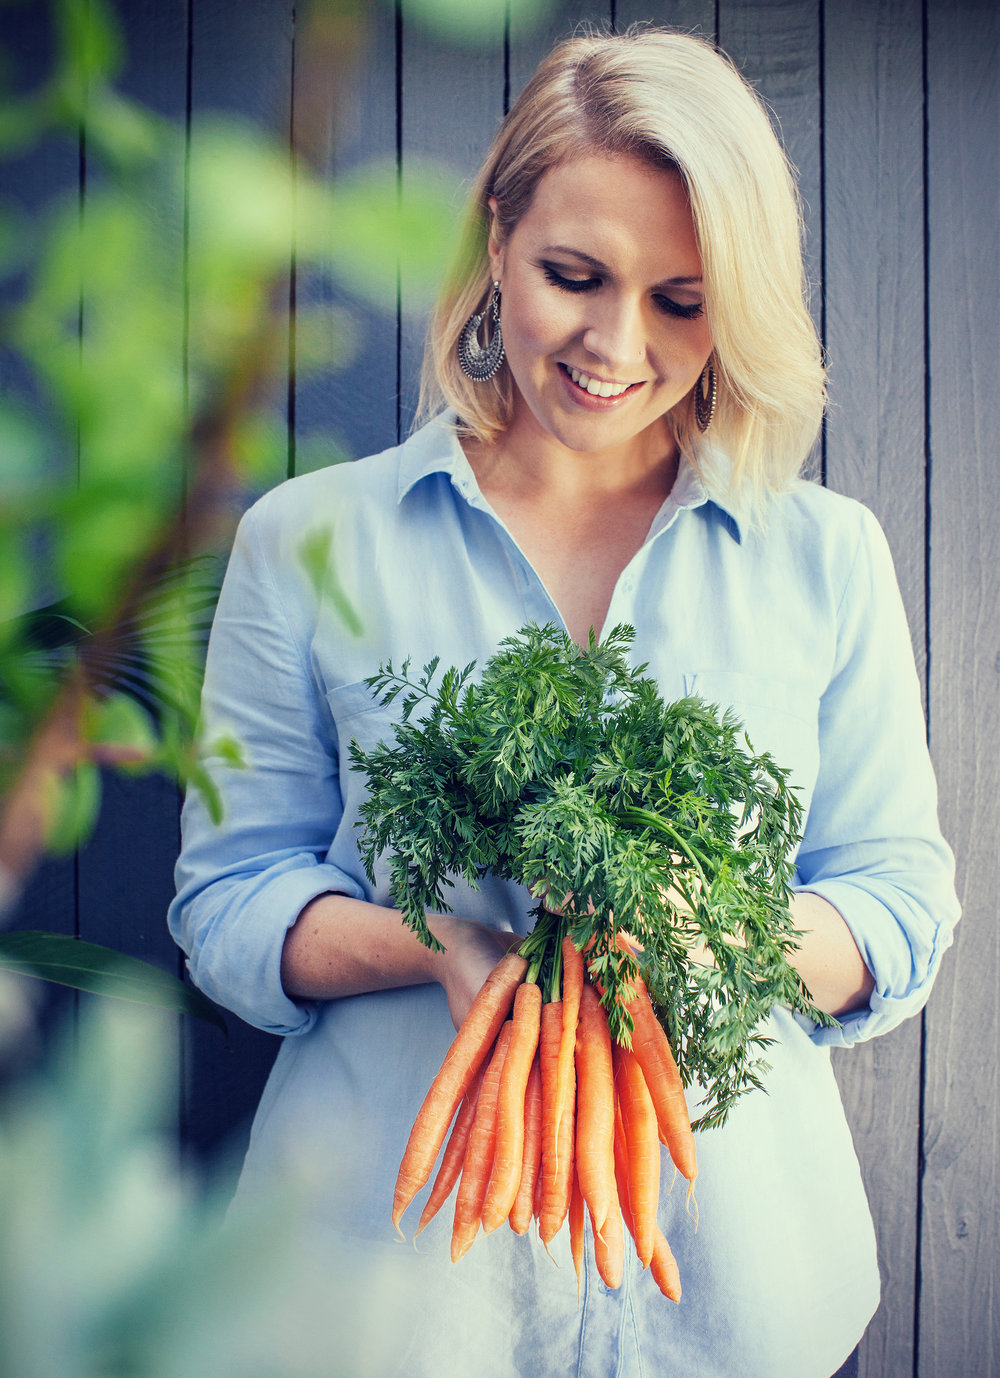 georgia-barnes-carrots-photo-stacey-hatfield